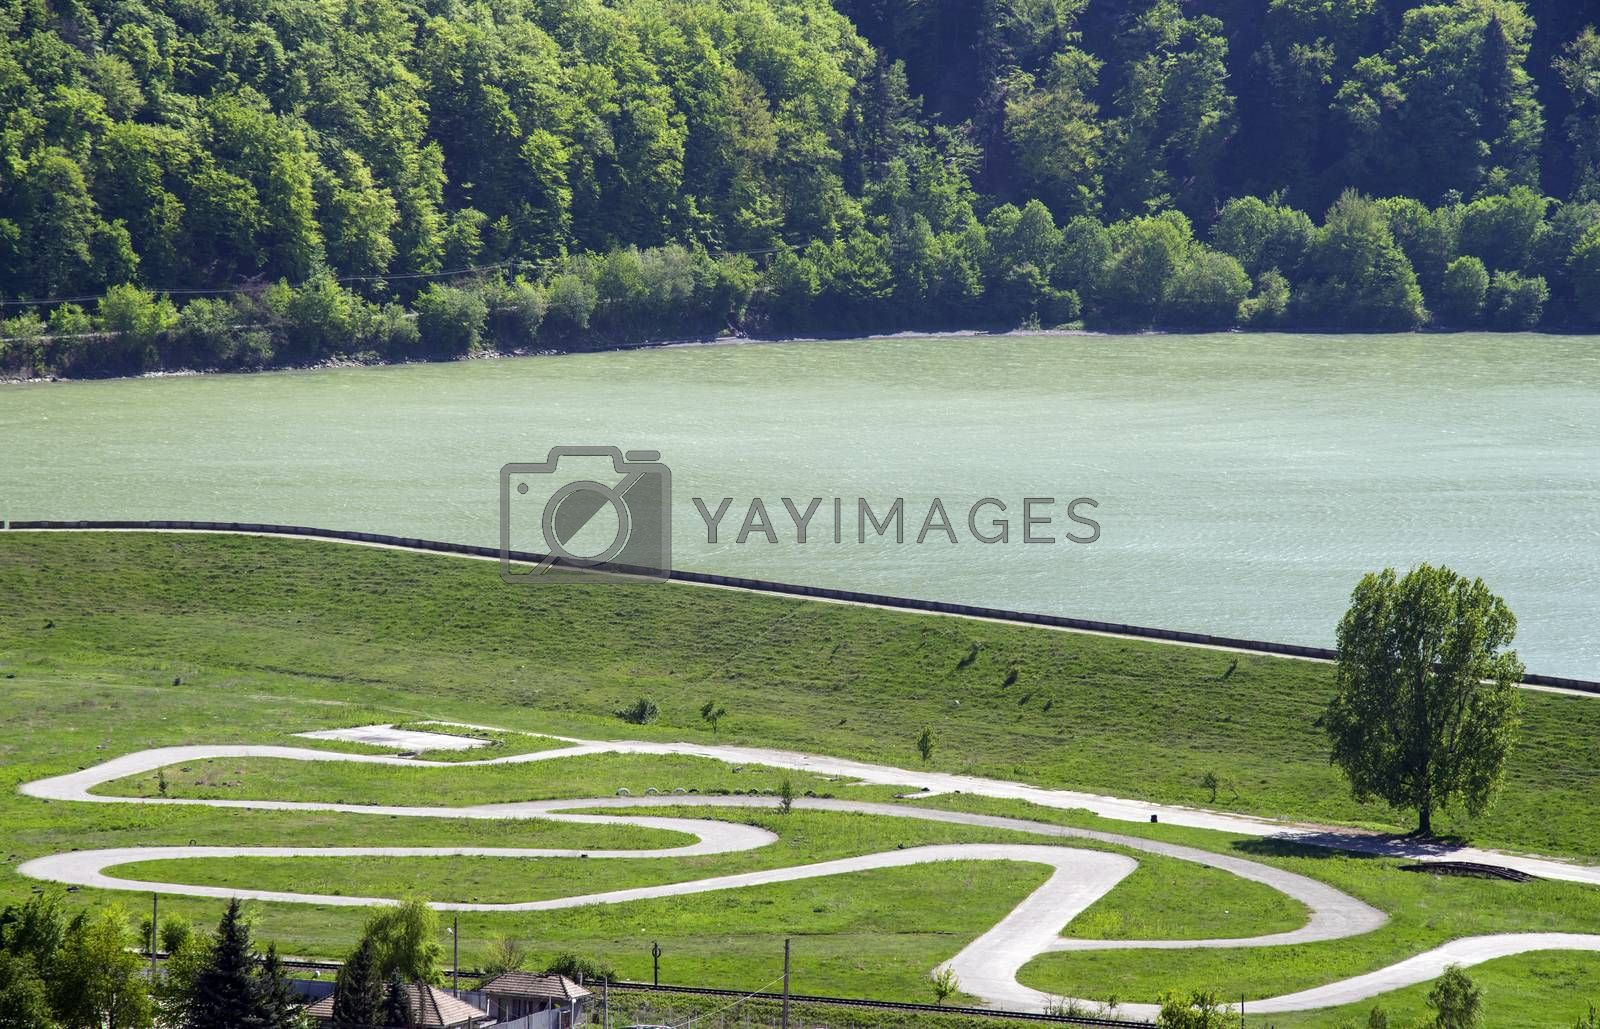 Karting race circuit near lake, aerial view